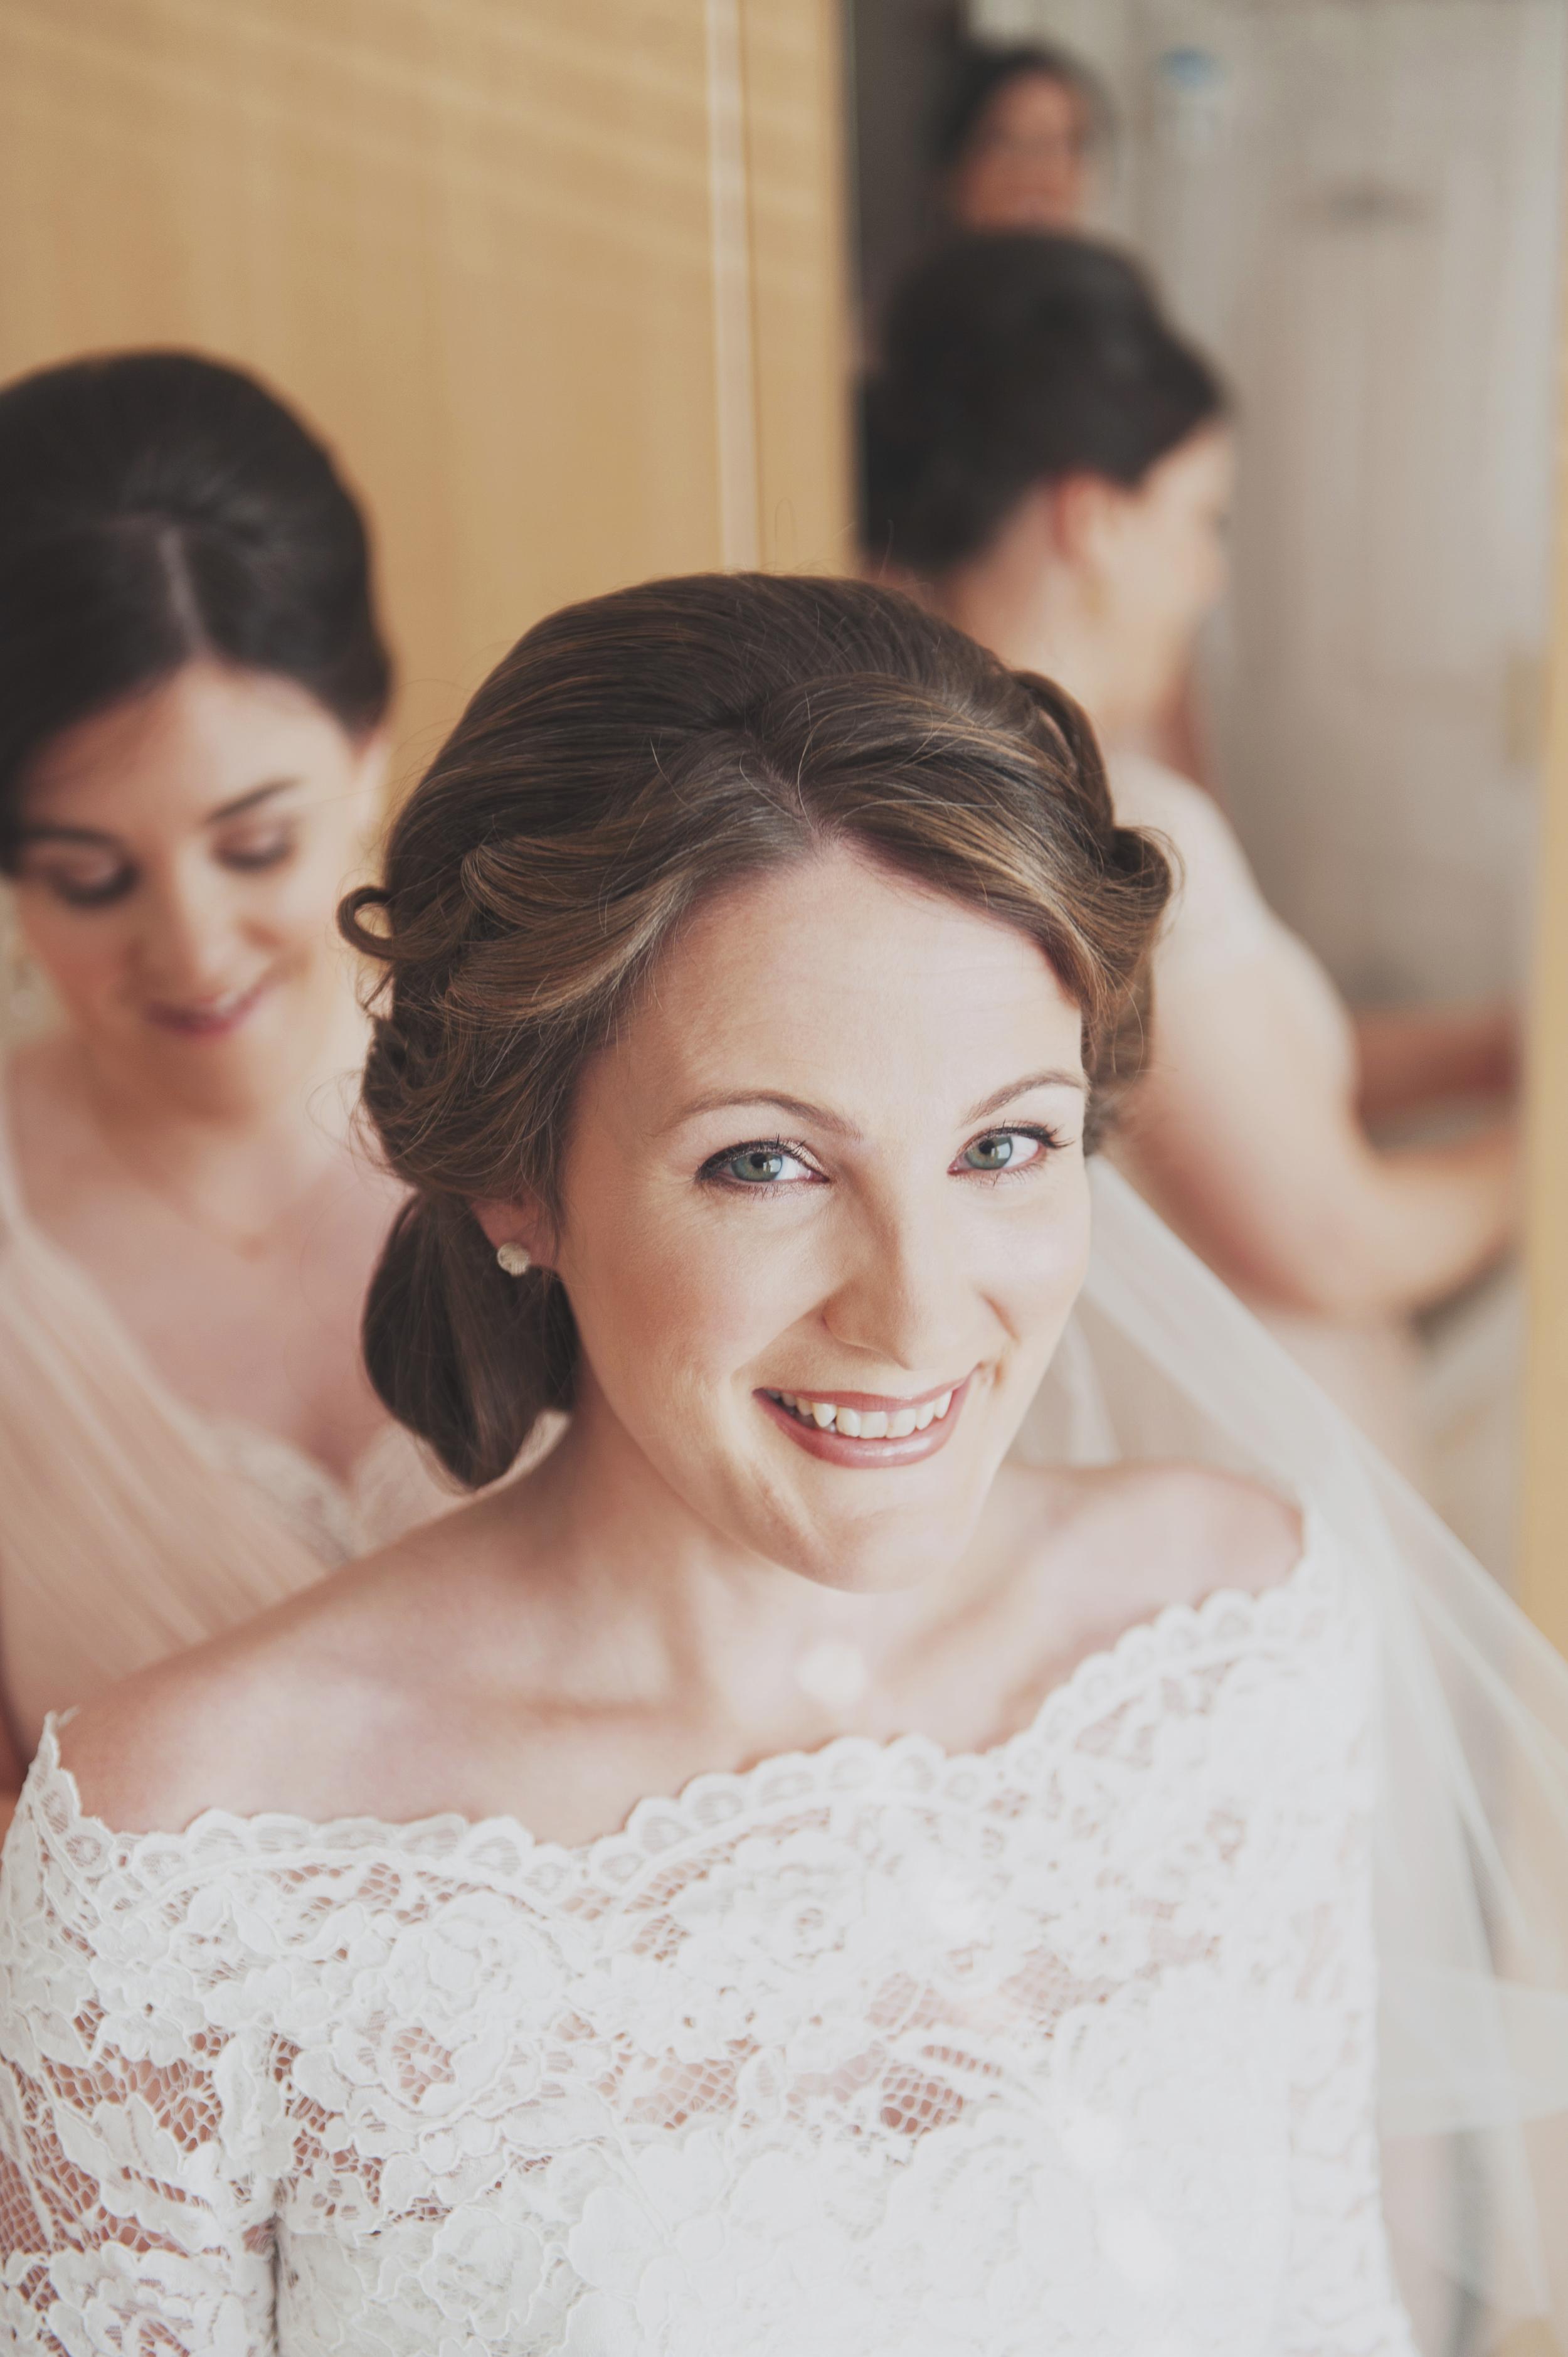 Carton_House_Wedding_Photography_Maynooth_Ireland_021.jpg